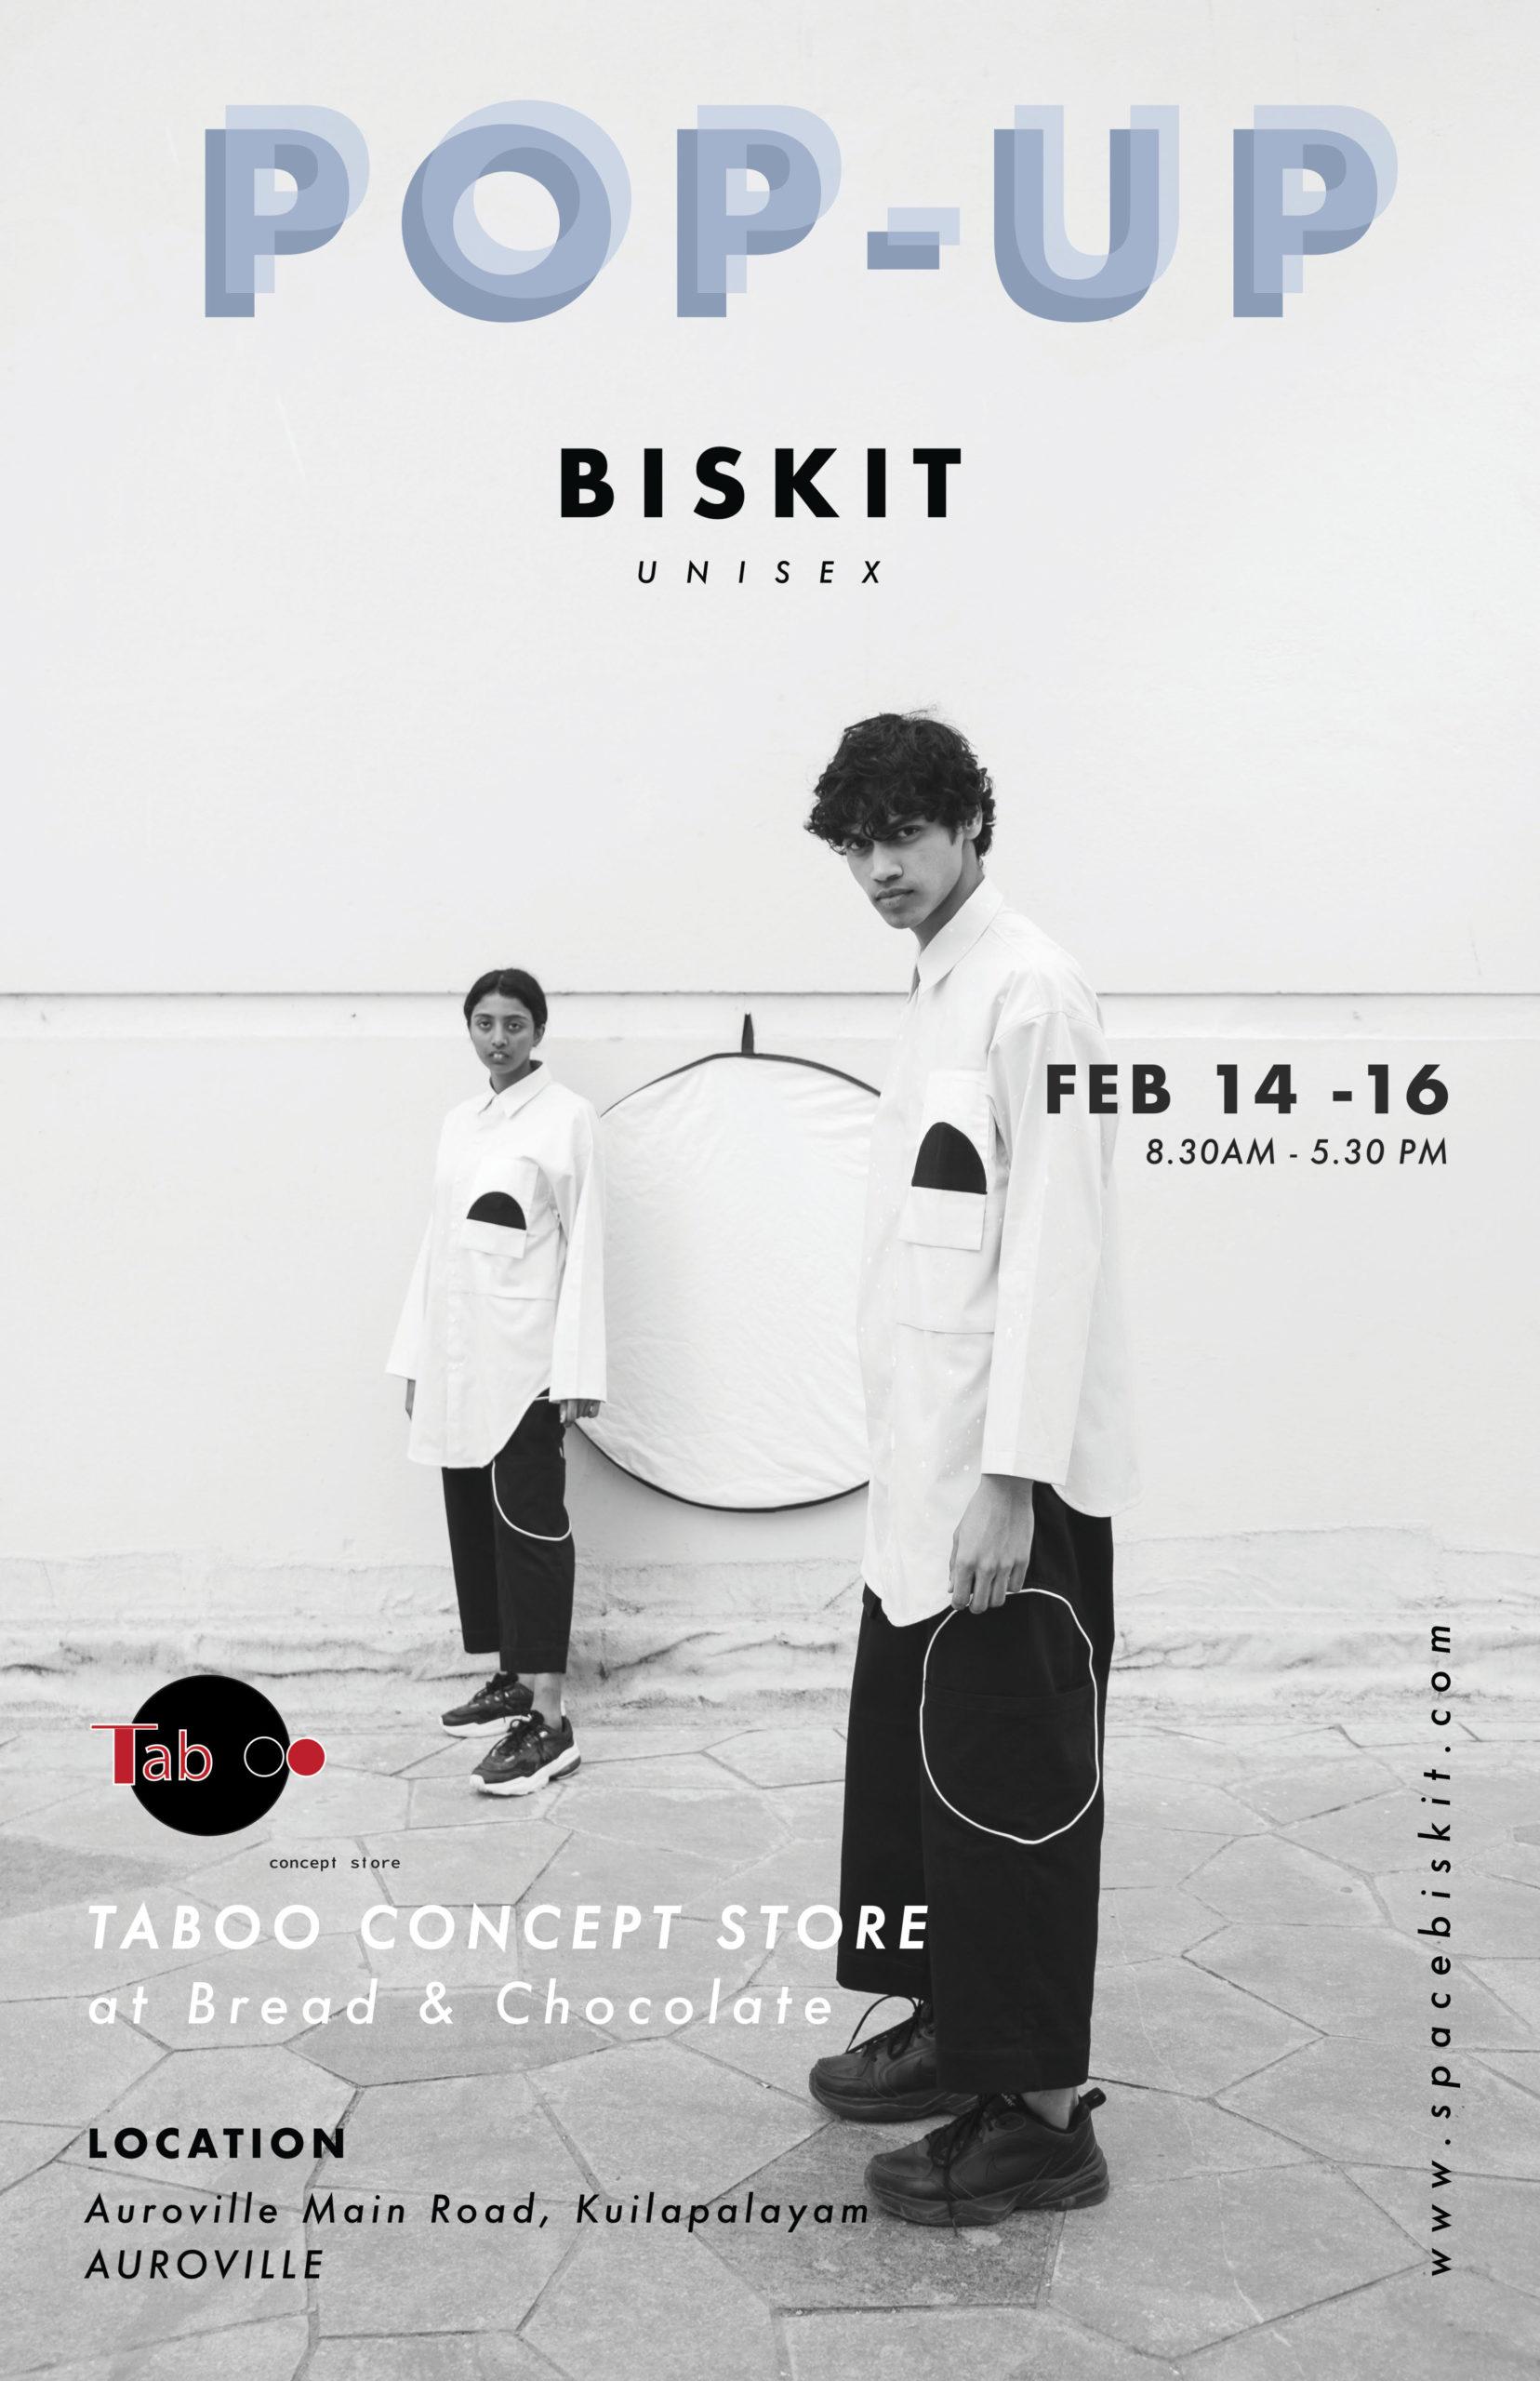 Space Biskit pop-up shop